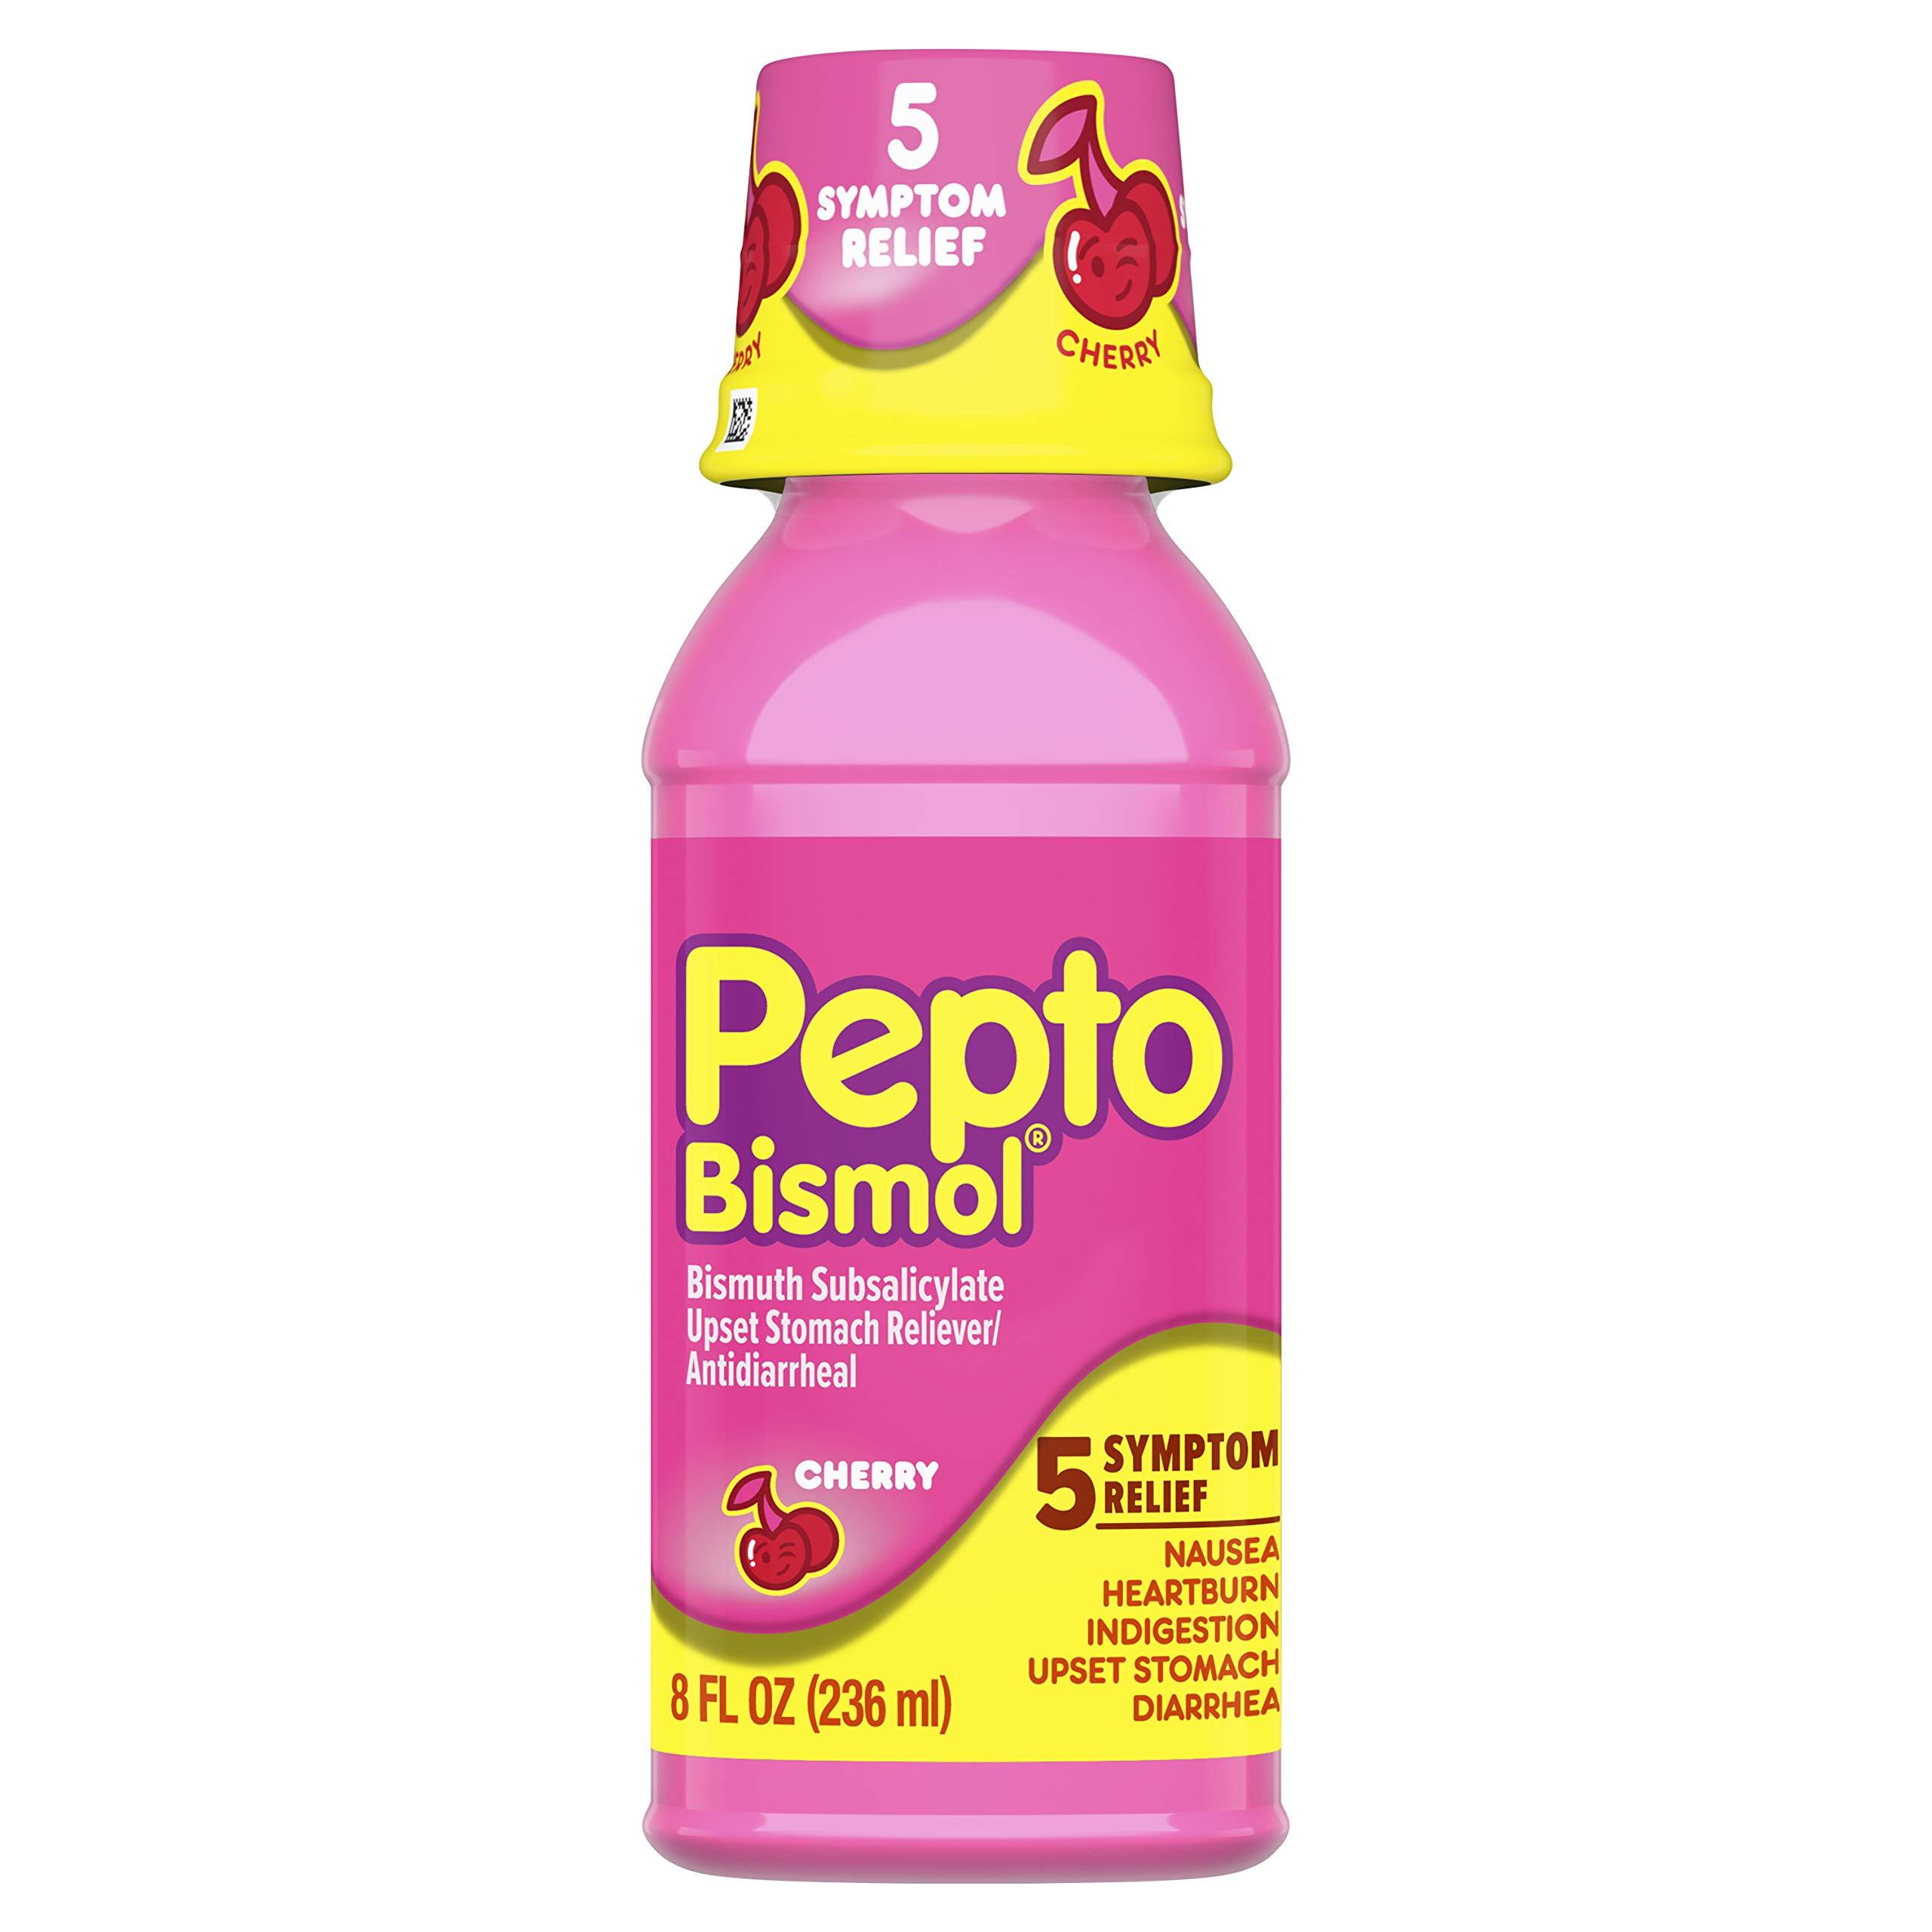 Pepto-Bismol Cherry Liquid 5 Symptom